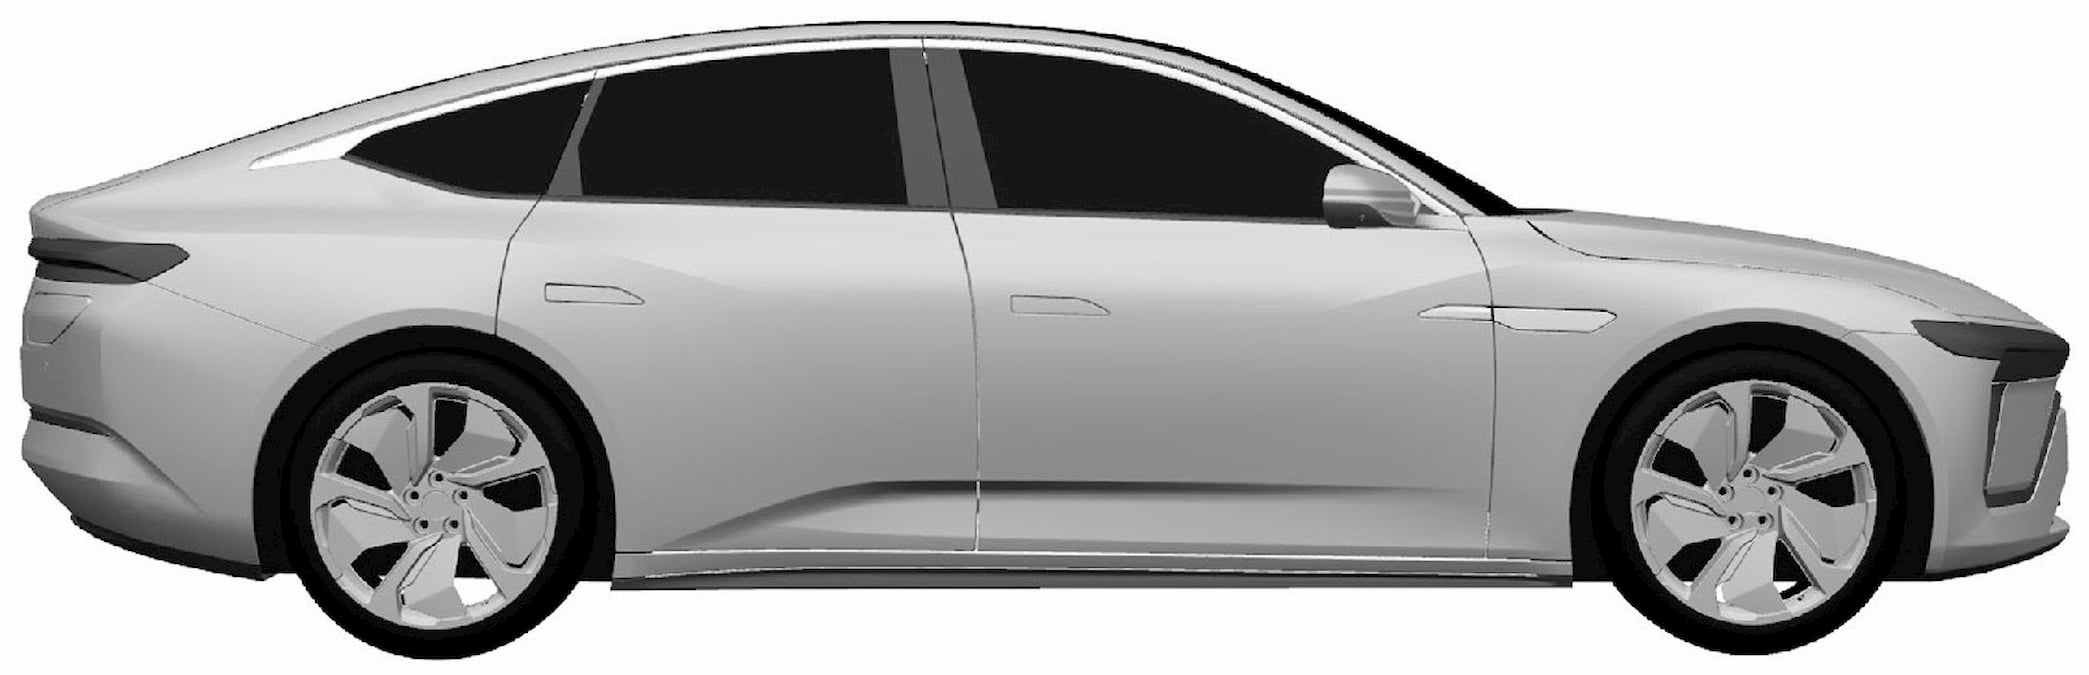 Production Nio sedan side